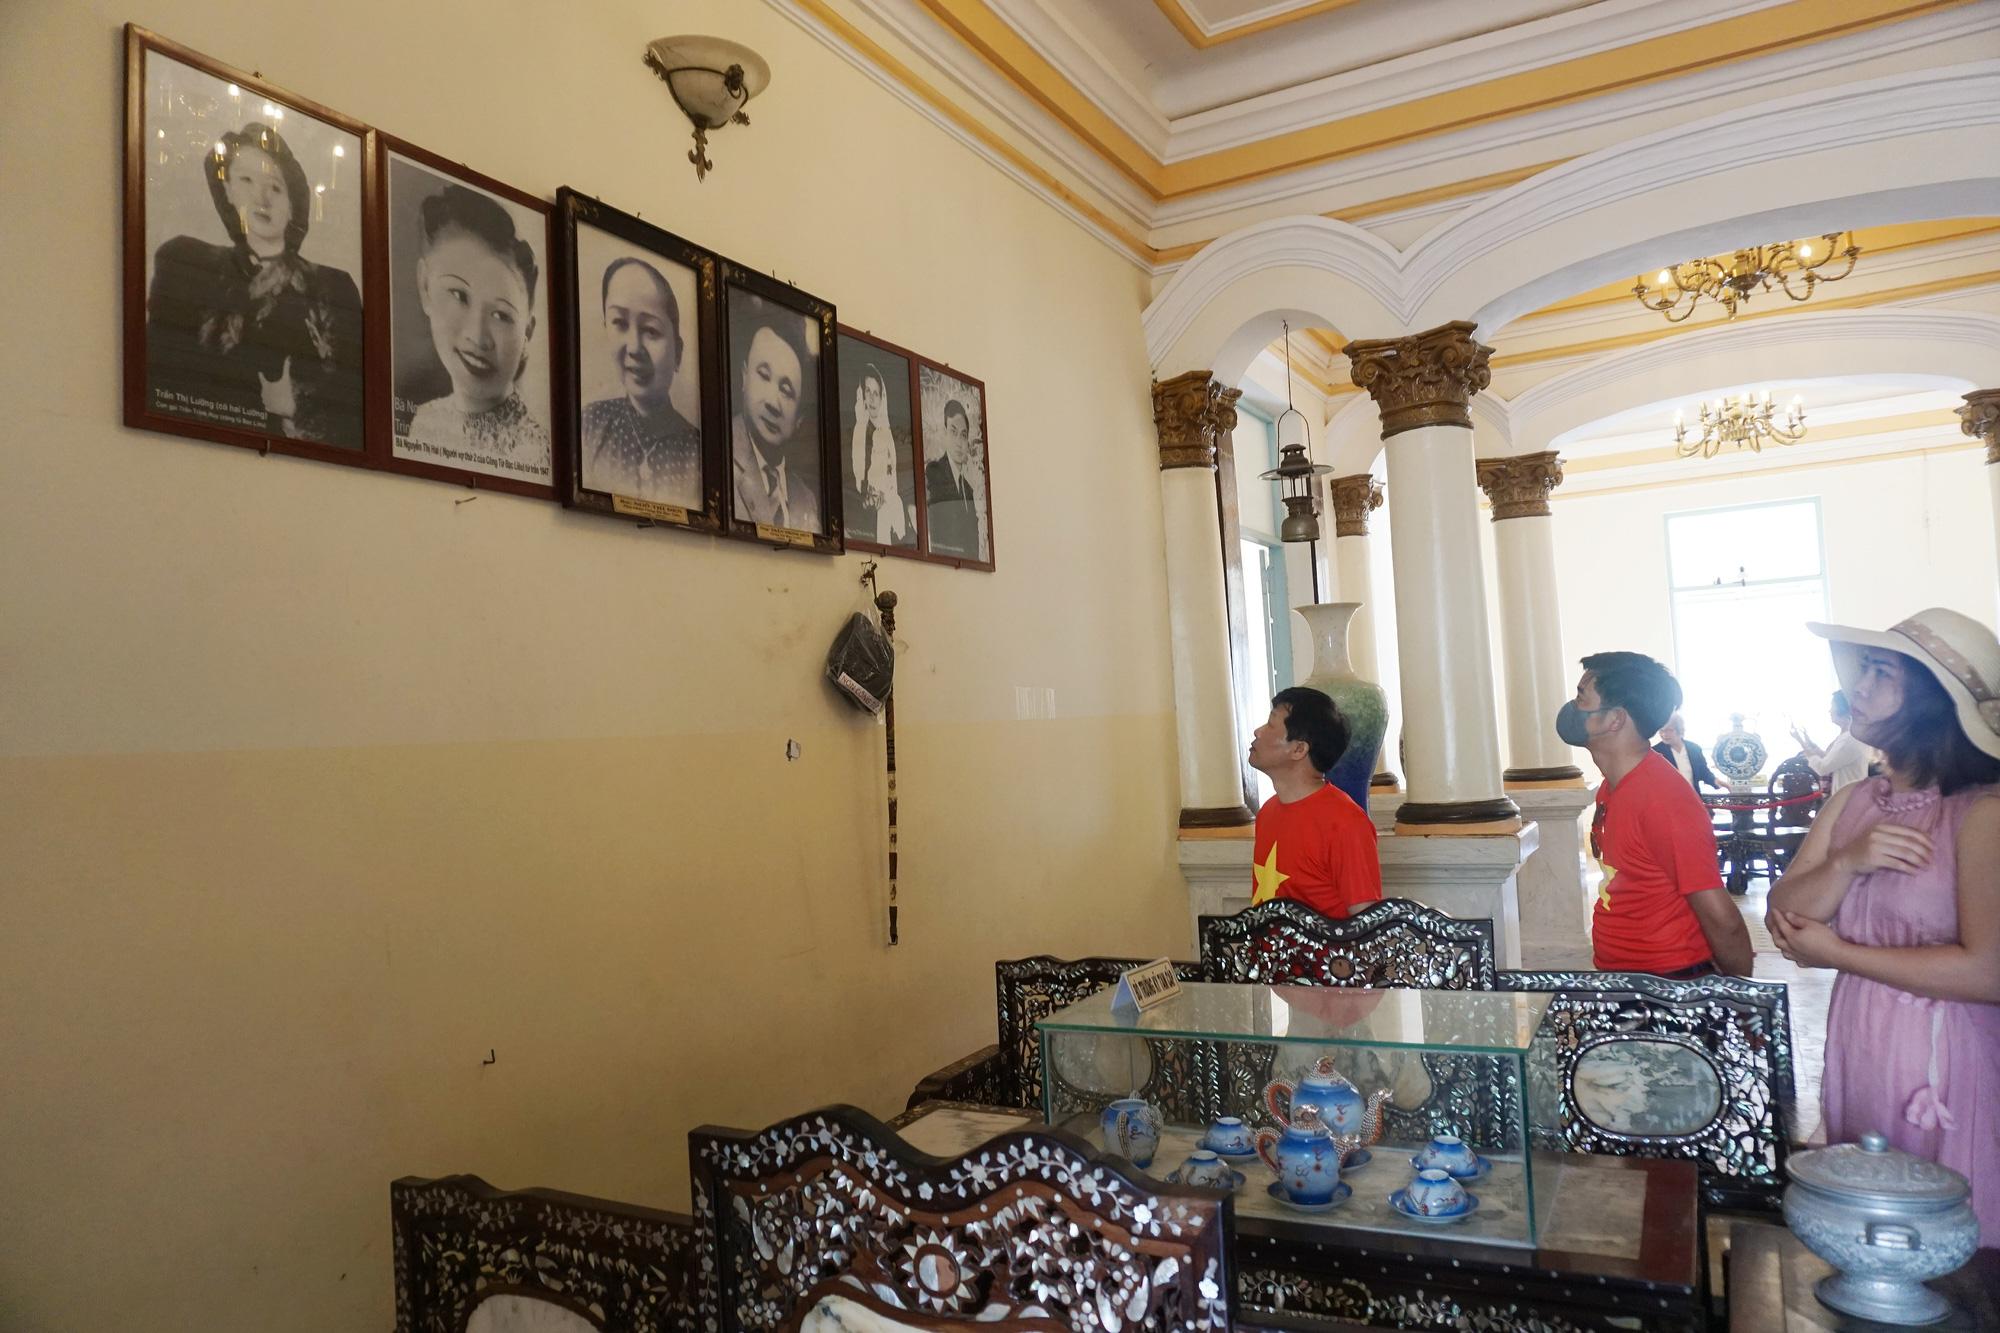 Tourists visit Prince of Bac Lieu House, located at 13 Dien Bien Phu Street, Ward 3, Bac Lieu City, Bac Lieu Province, Vietnam. Photo: Tuyet Kieu / Tuoi Tre